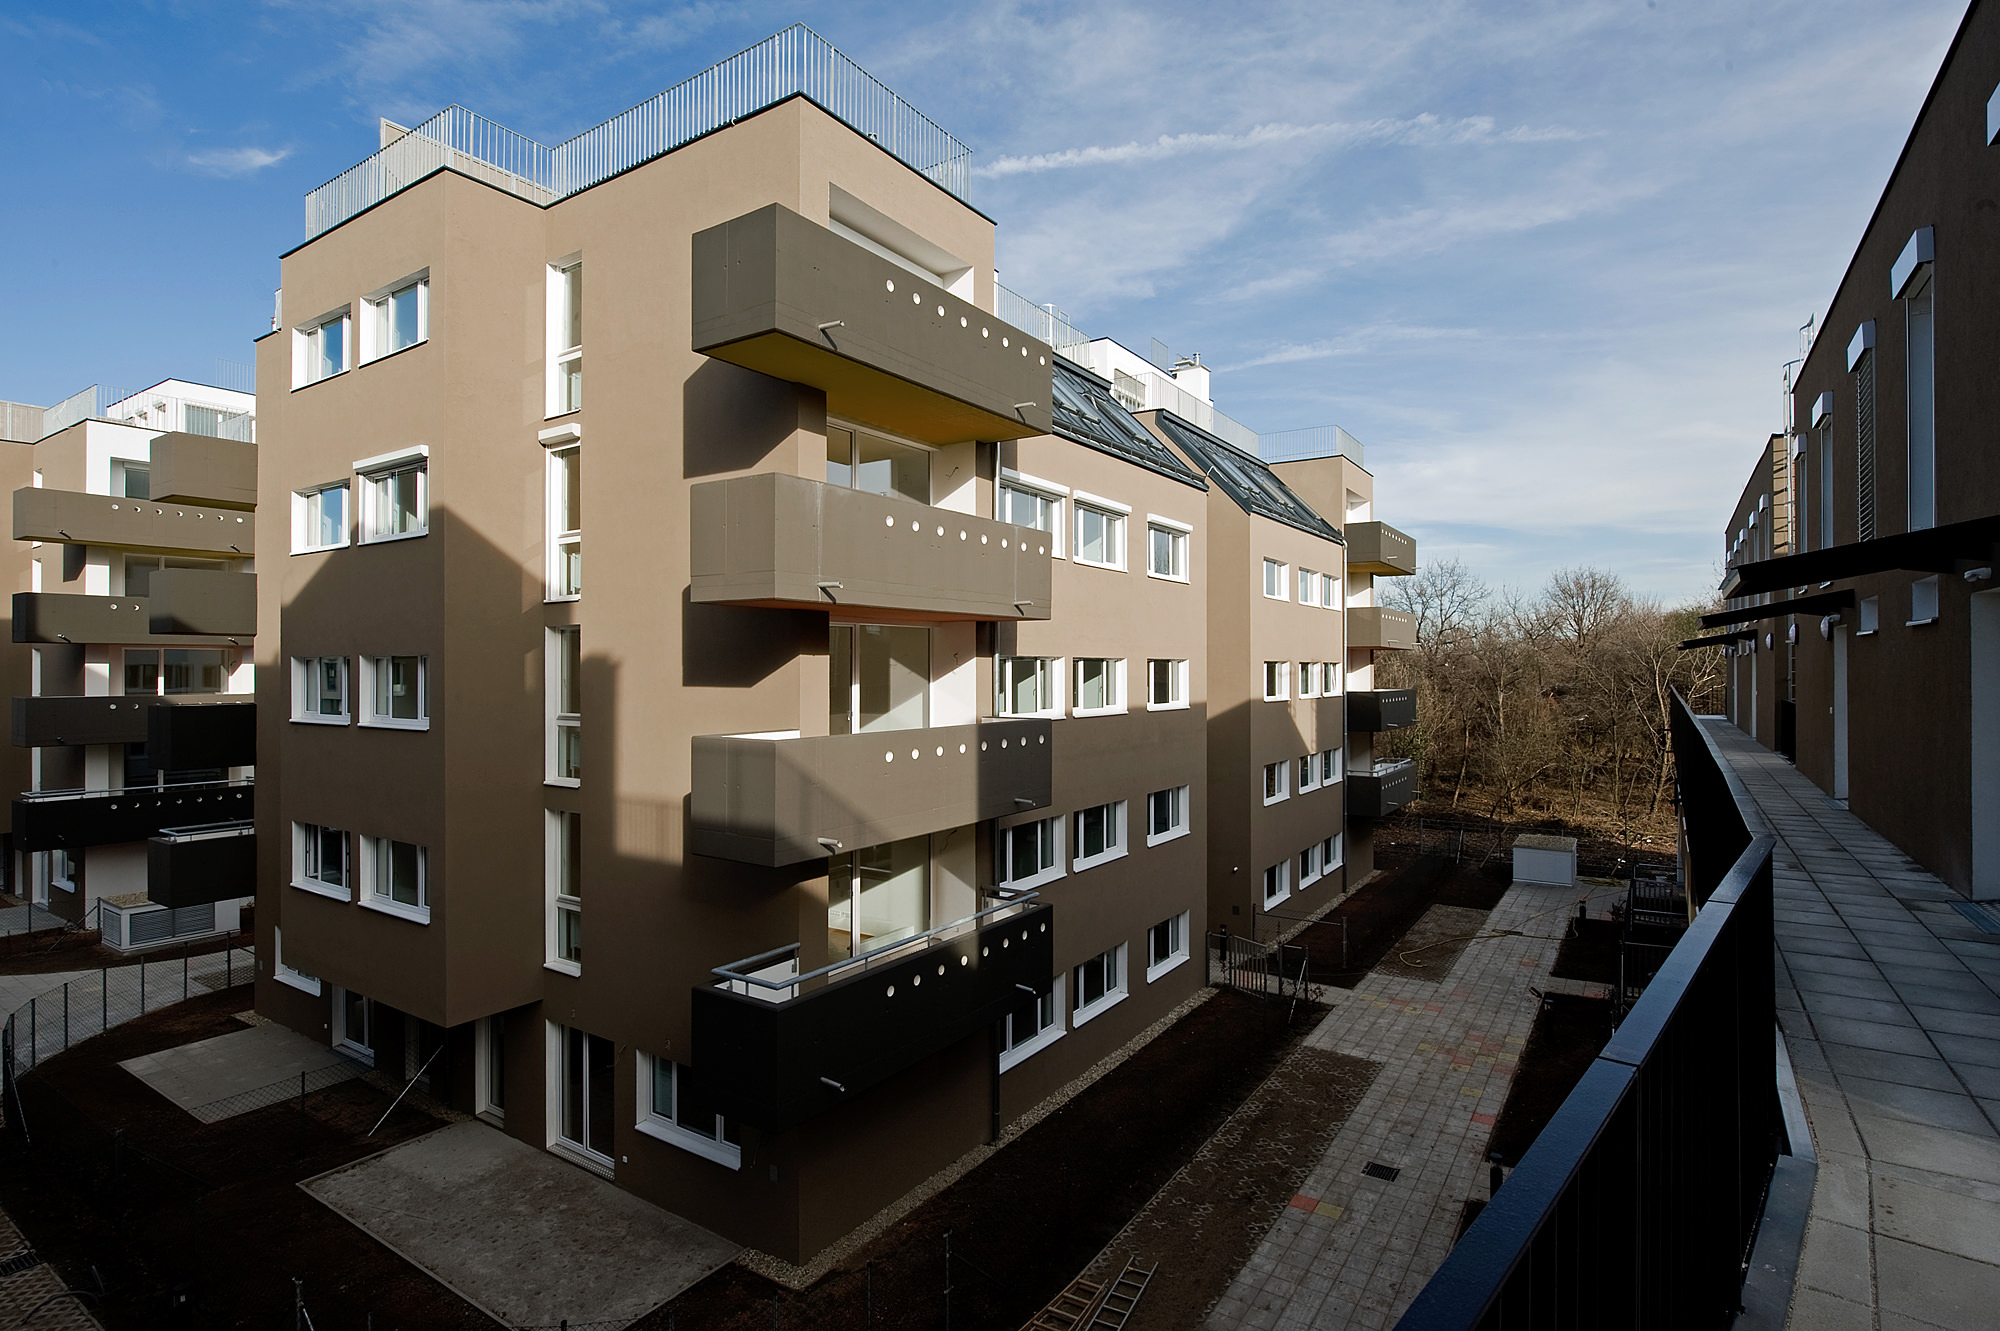 moselgasse 03 wohnbau 1100 wien junger beer architektur